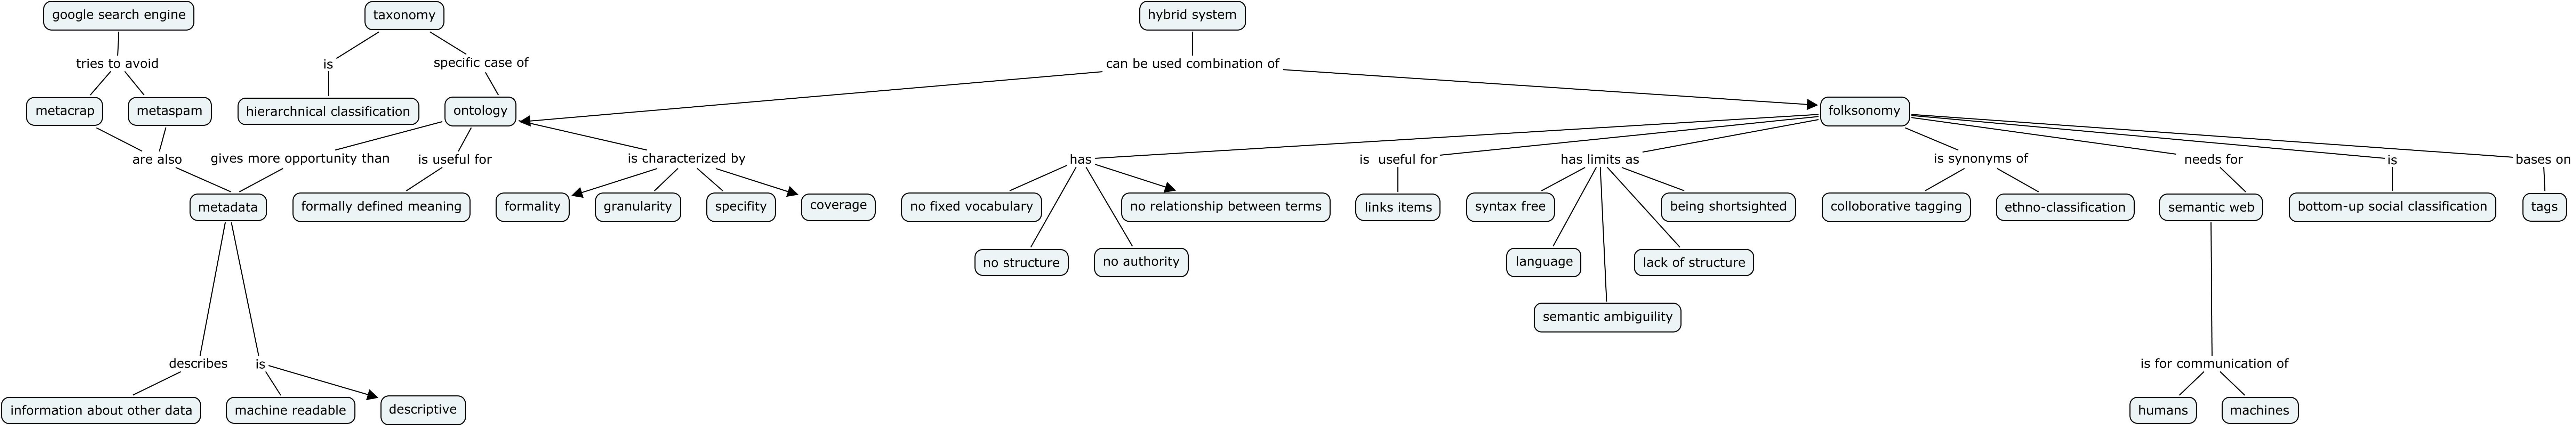 Master thesis folksonomy